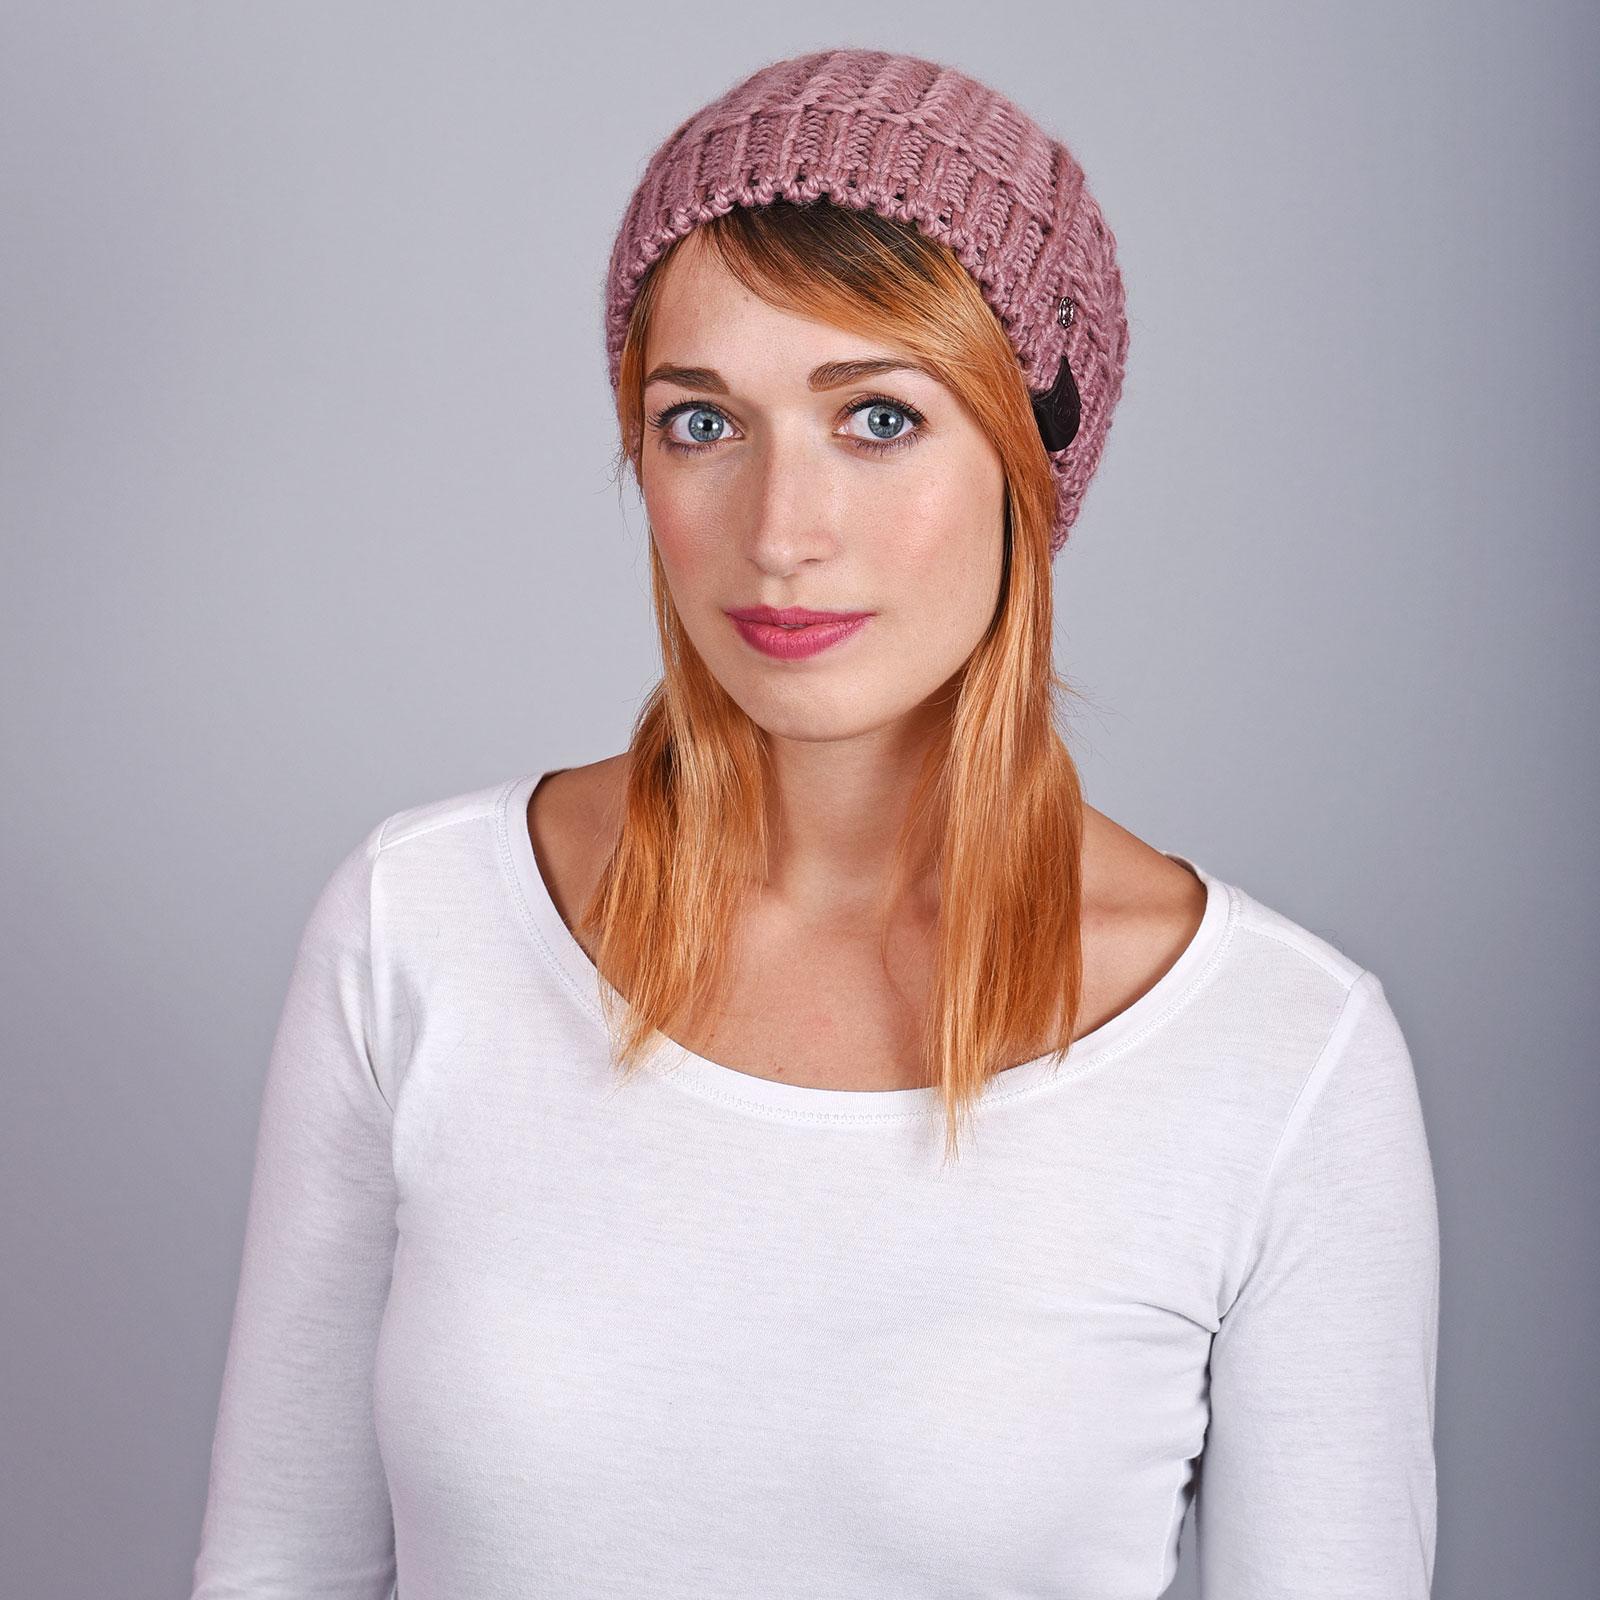 CP-01070-VF16-2-bonnet-femme-hiver-rose